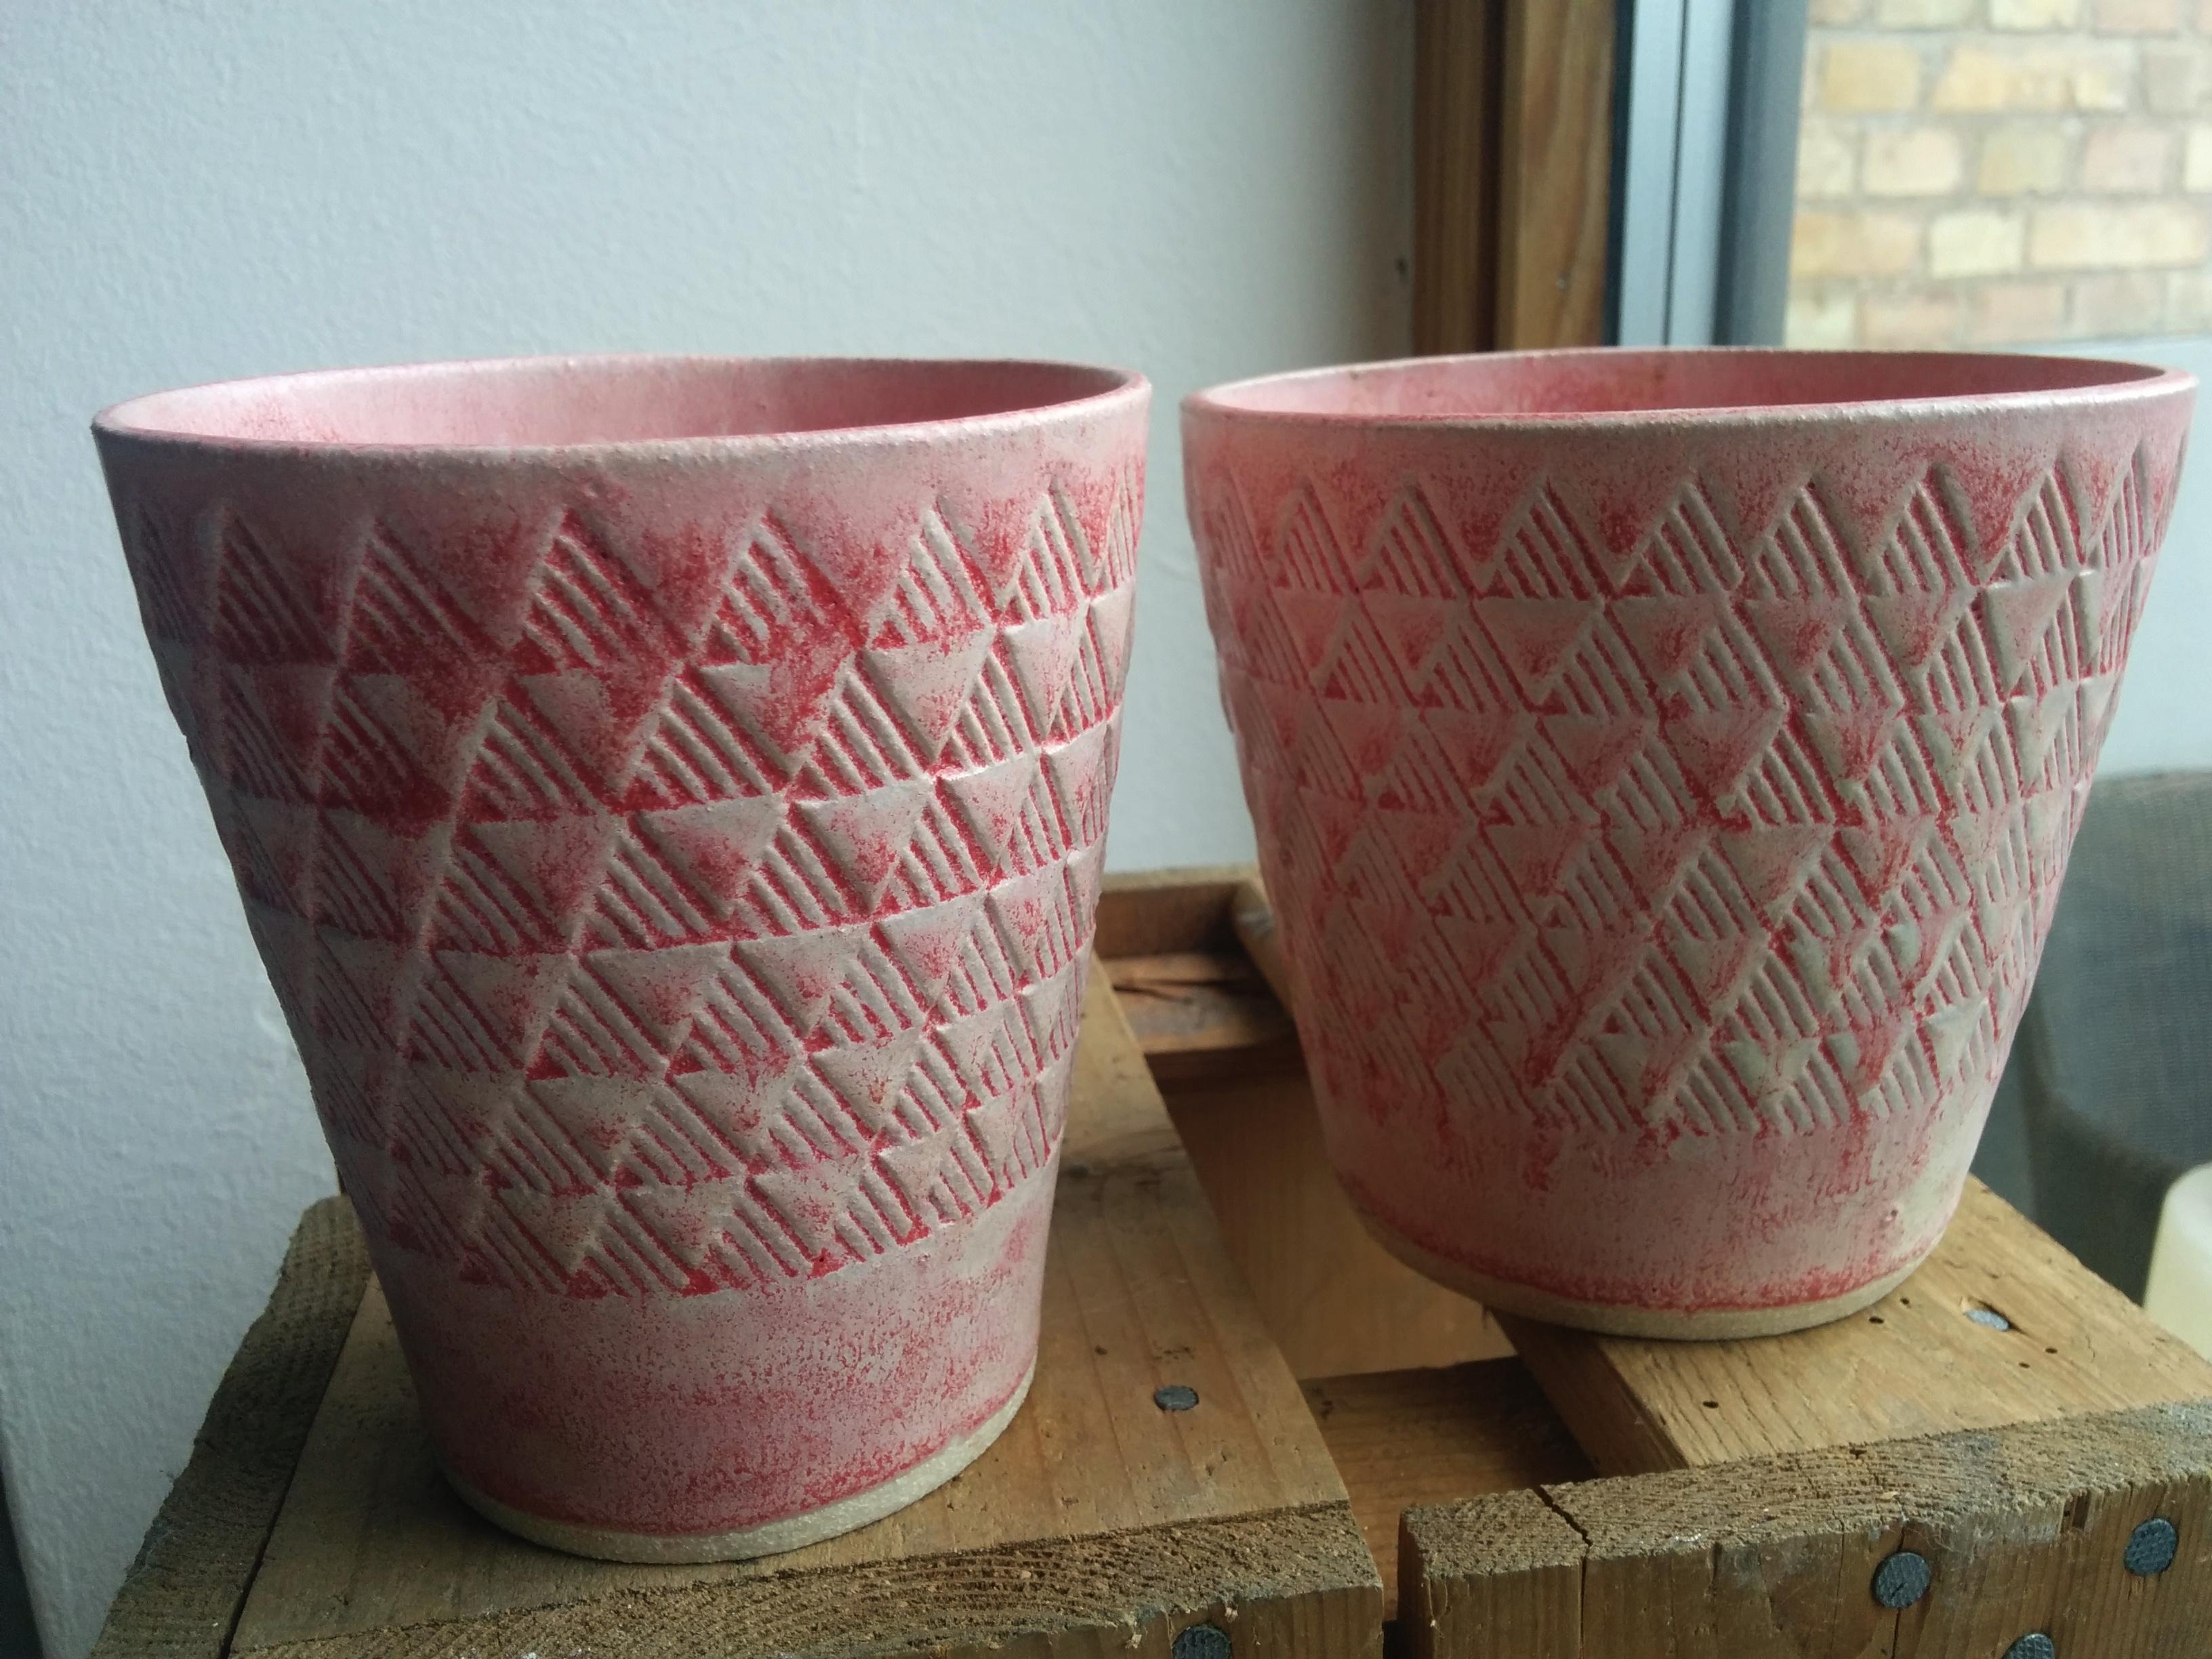 Unika potter med print